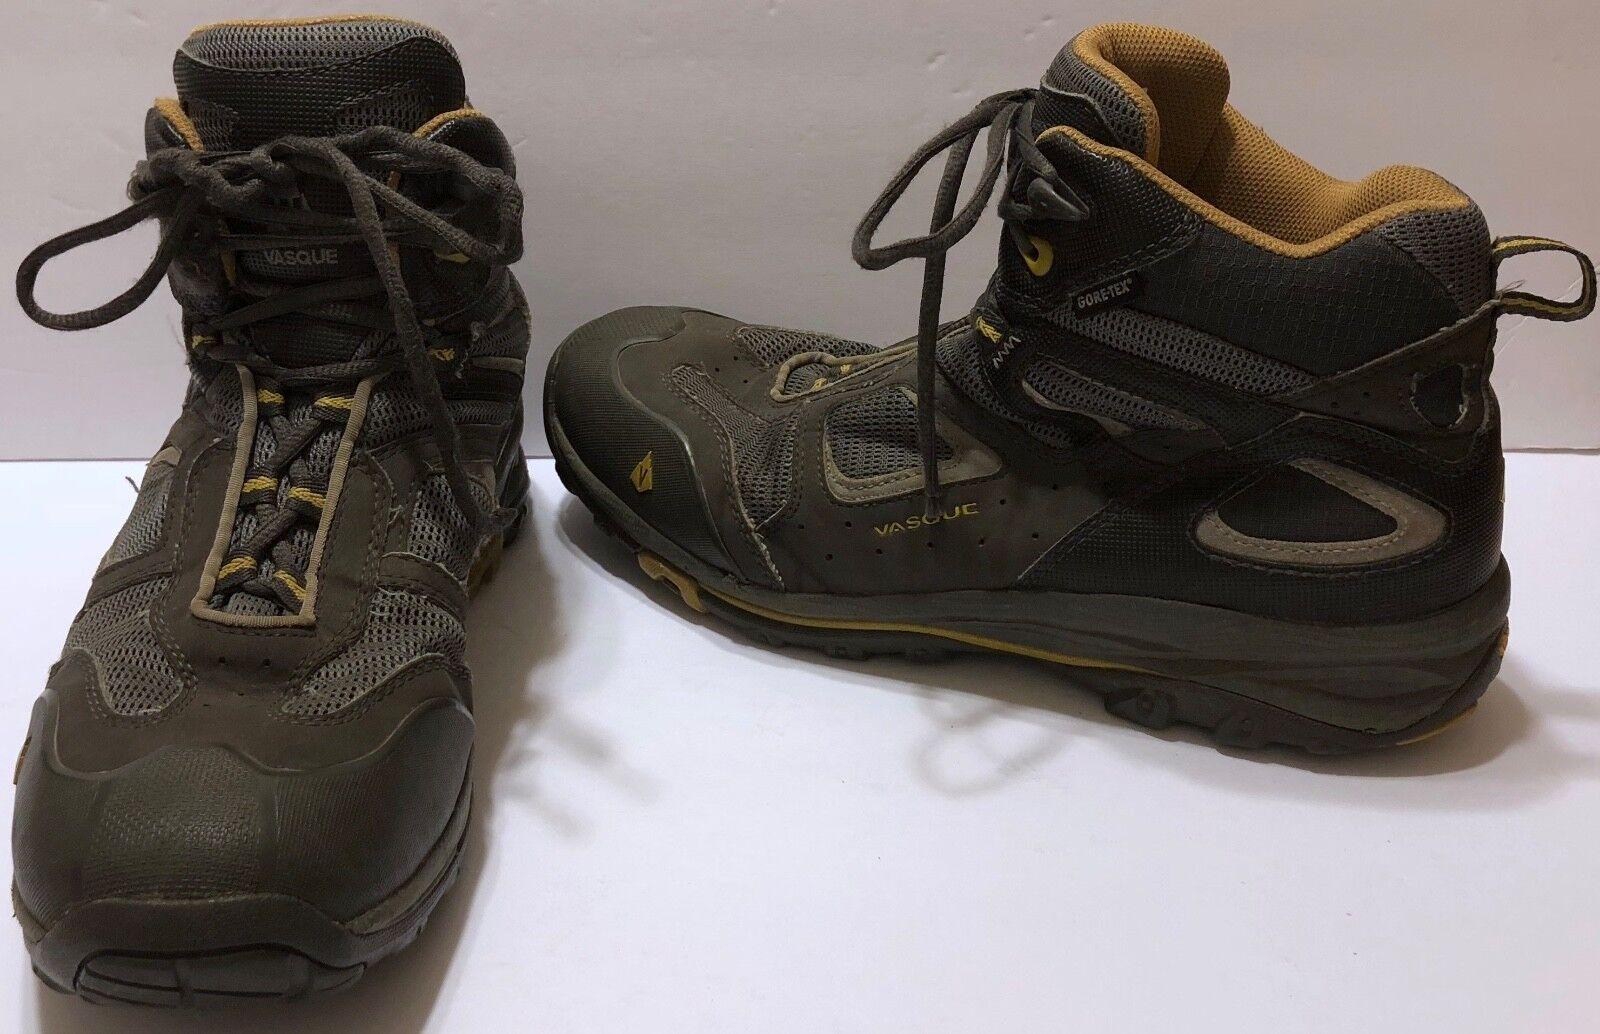 Vasque Breeze GTX Hiking Boots Soles Sz 11 M Vibram Soles Boots Gore Tex Hike Trail Dry Feet 224edc